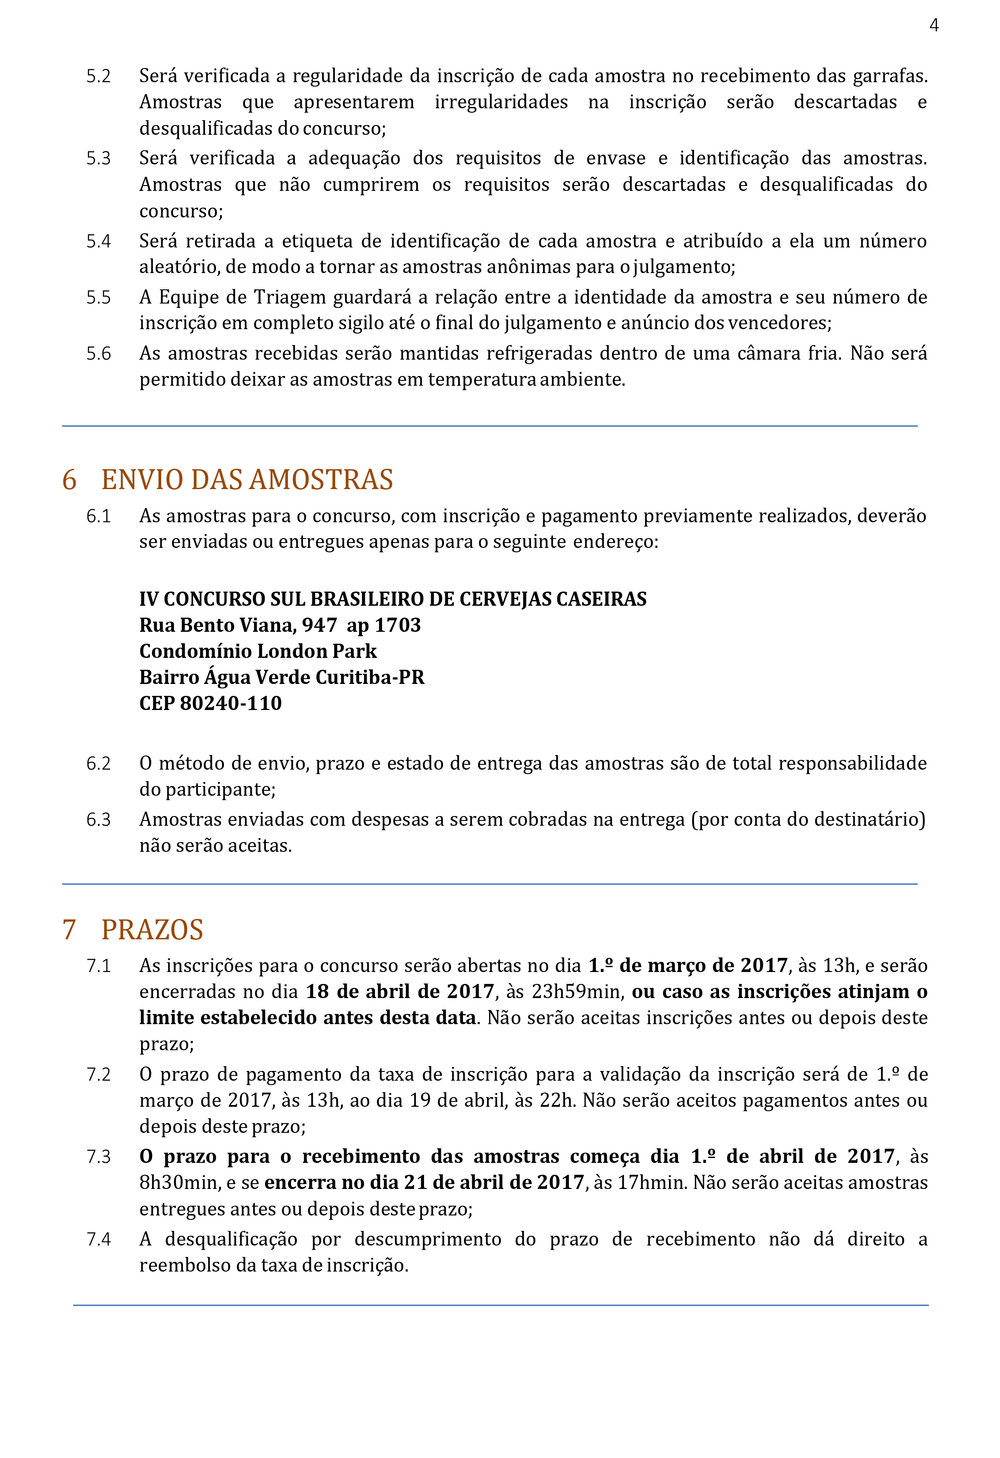 IV Concurso Sulbrasileiro 2017-Regulamento-4.jpg